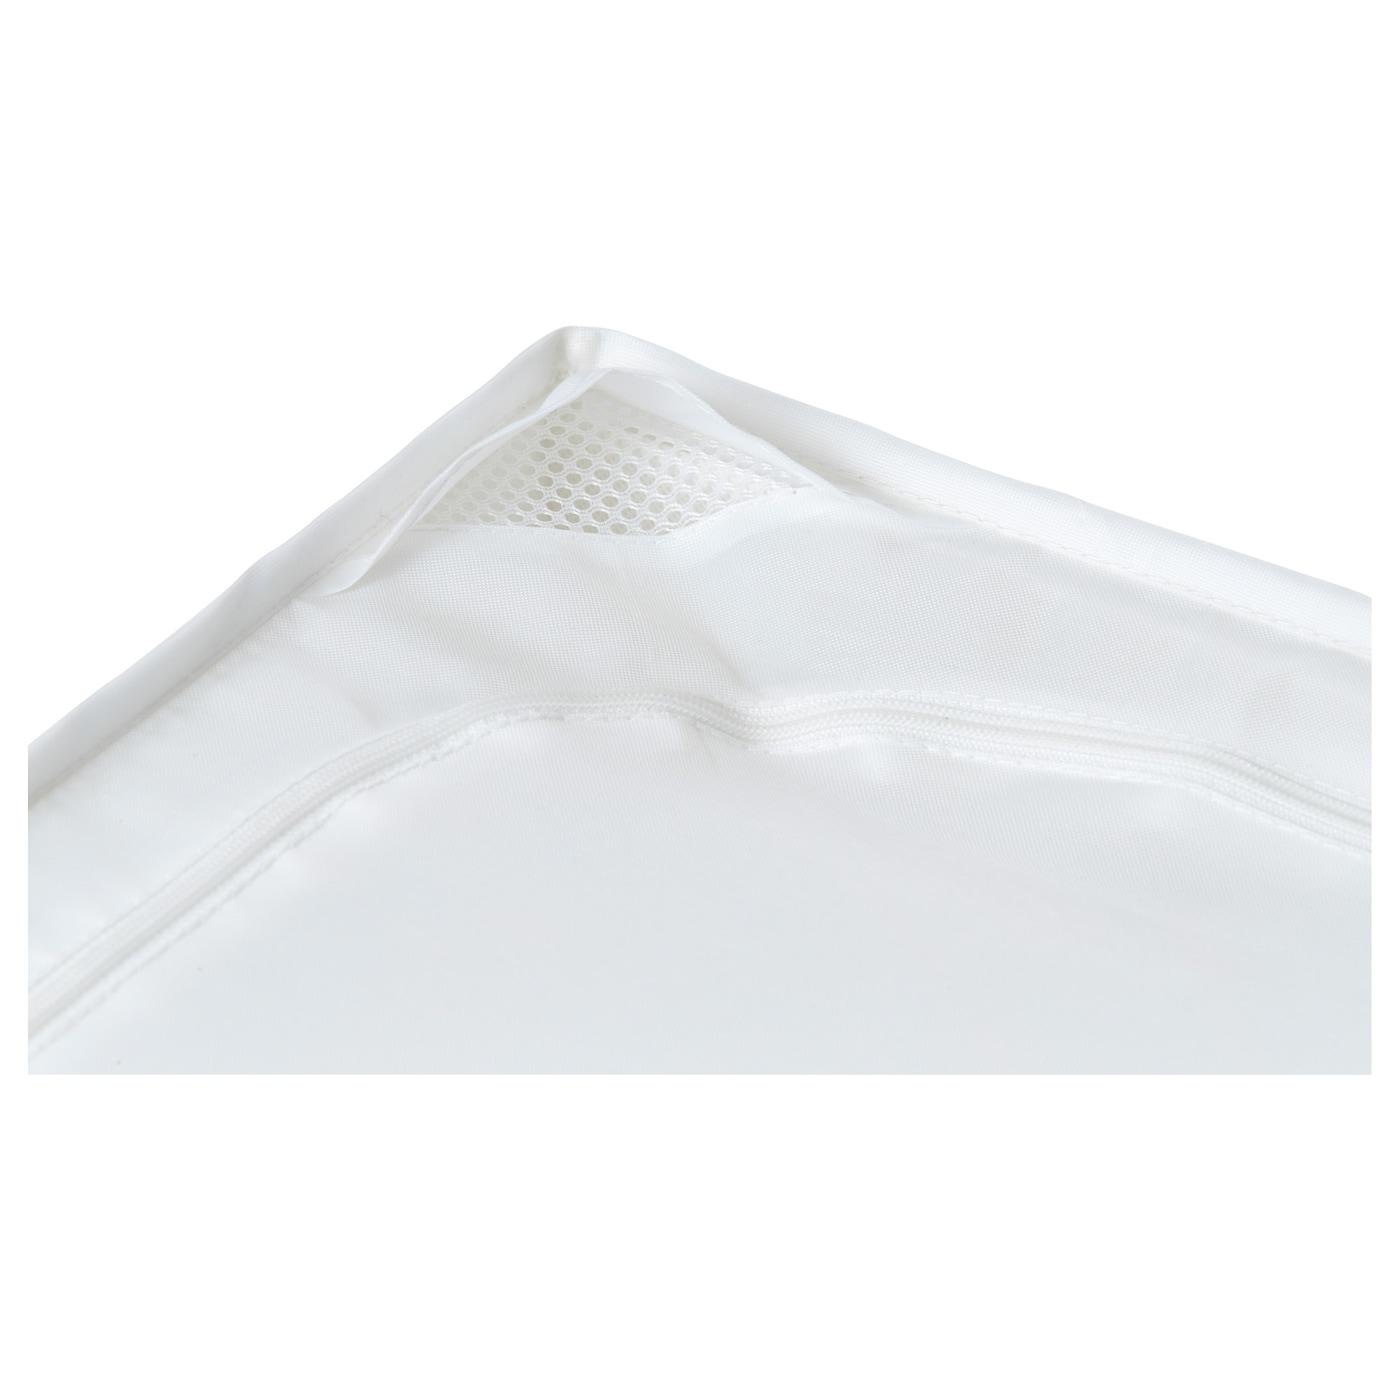 64x64x120cm vrsupin0 Funda Protectora Dom/ésticos Multiuso Mesa Muebles Jard/ín Anti UV Exterior Rasgu/ño Resistente Polvo Patio Impermeable Duradero Silla Eco Amistoso 68x68x72cm - como Imagen Show